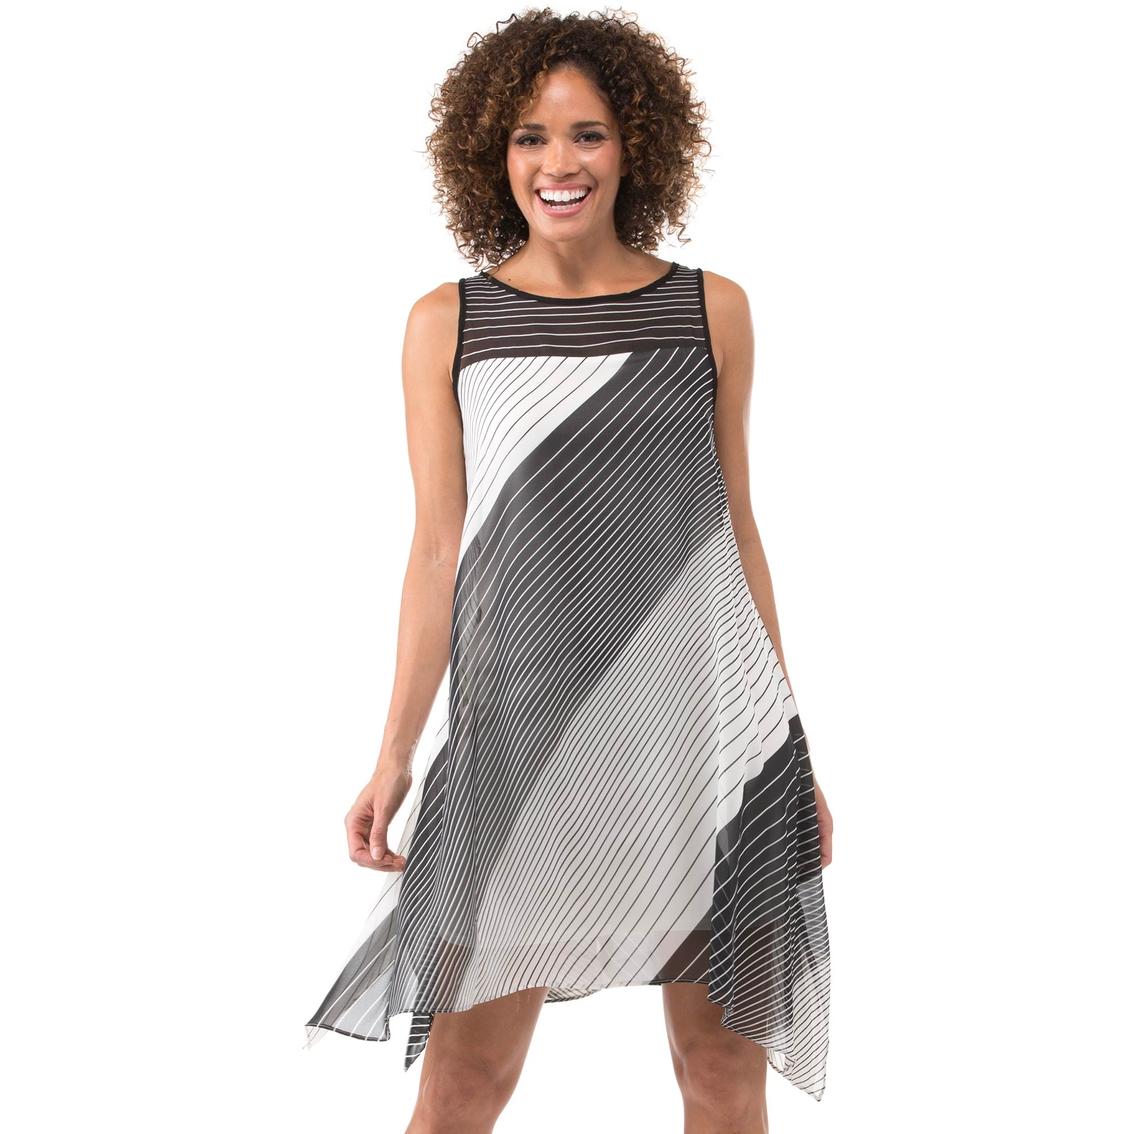 0a8b171d842c Robbie Bee Diagonal Striped Colorblock Chiffon Dress | Dresses ...